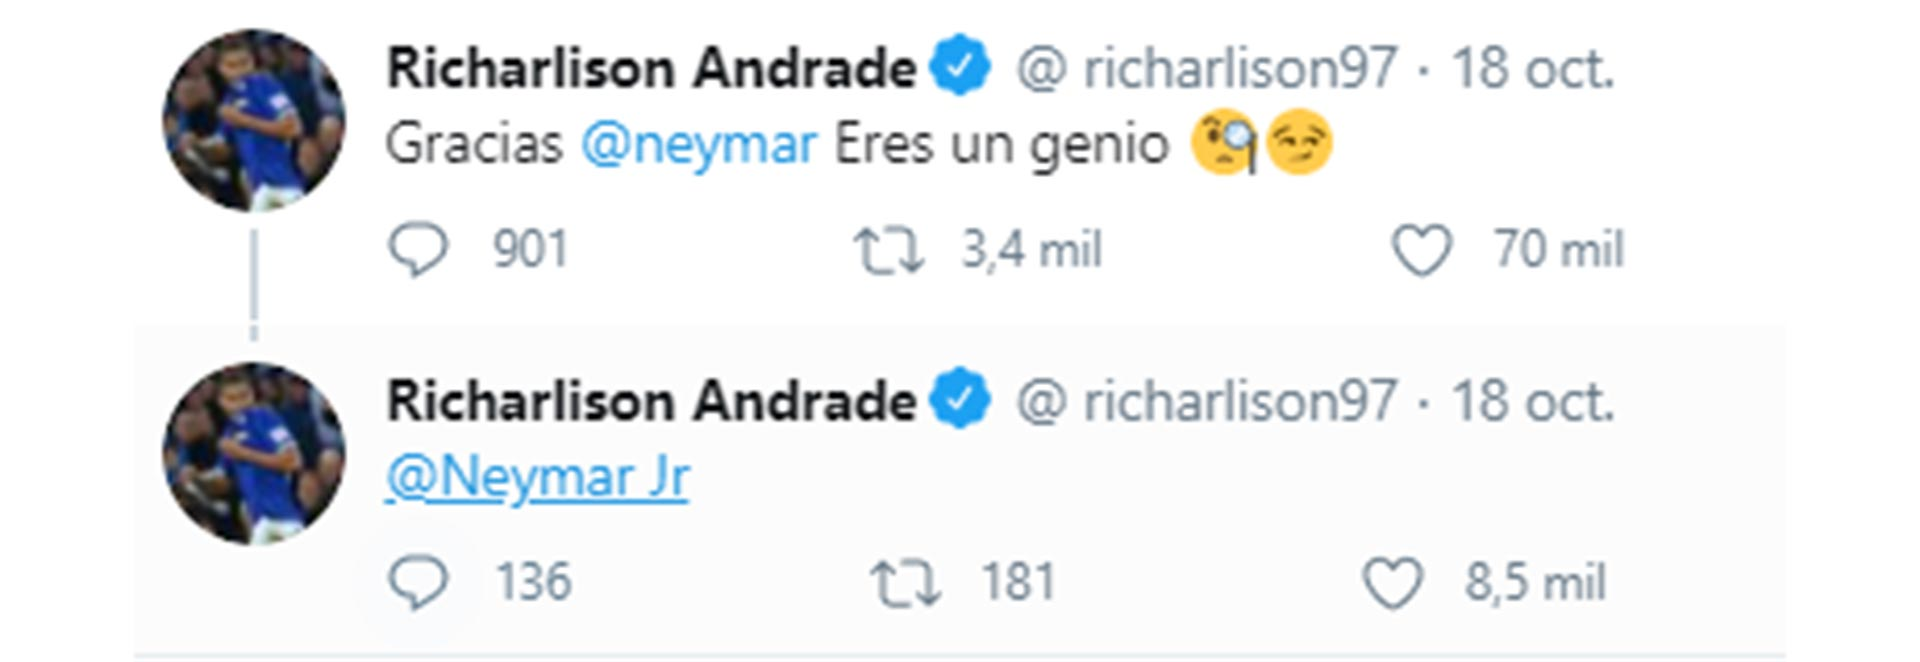 "El celular de Richarlison ""explotó"" por un error de Neymar (Twitter)"